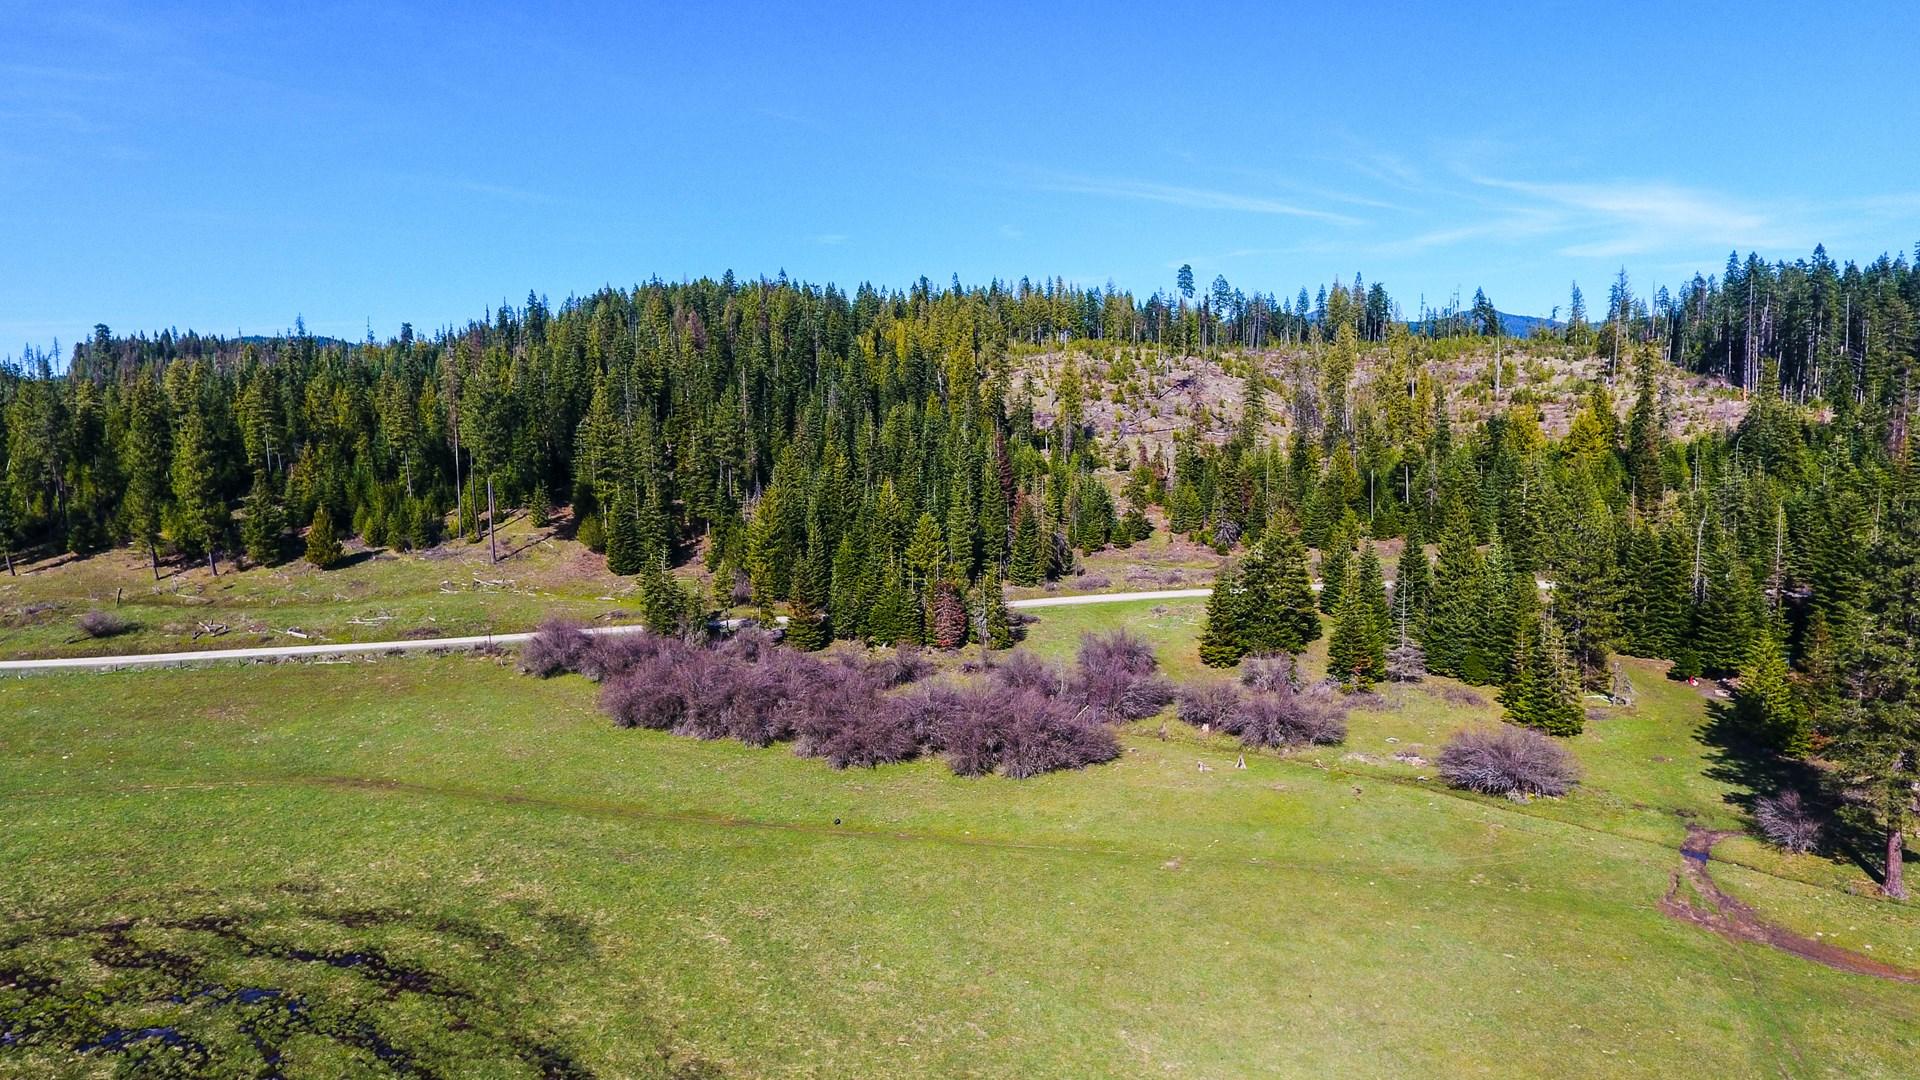 220 Acres Recreational Land,  Meadow Creek Rd, Harvard, ID